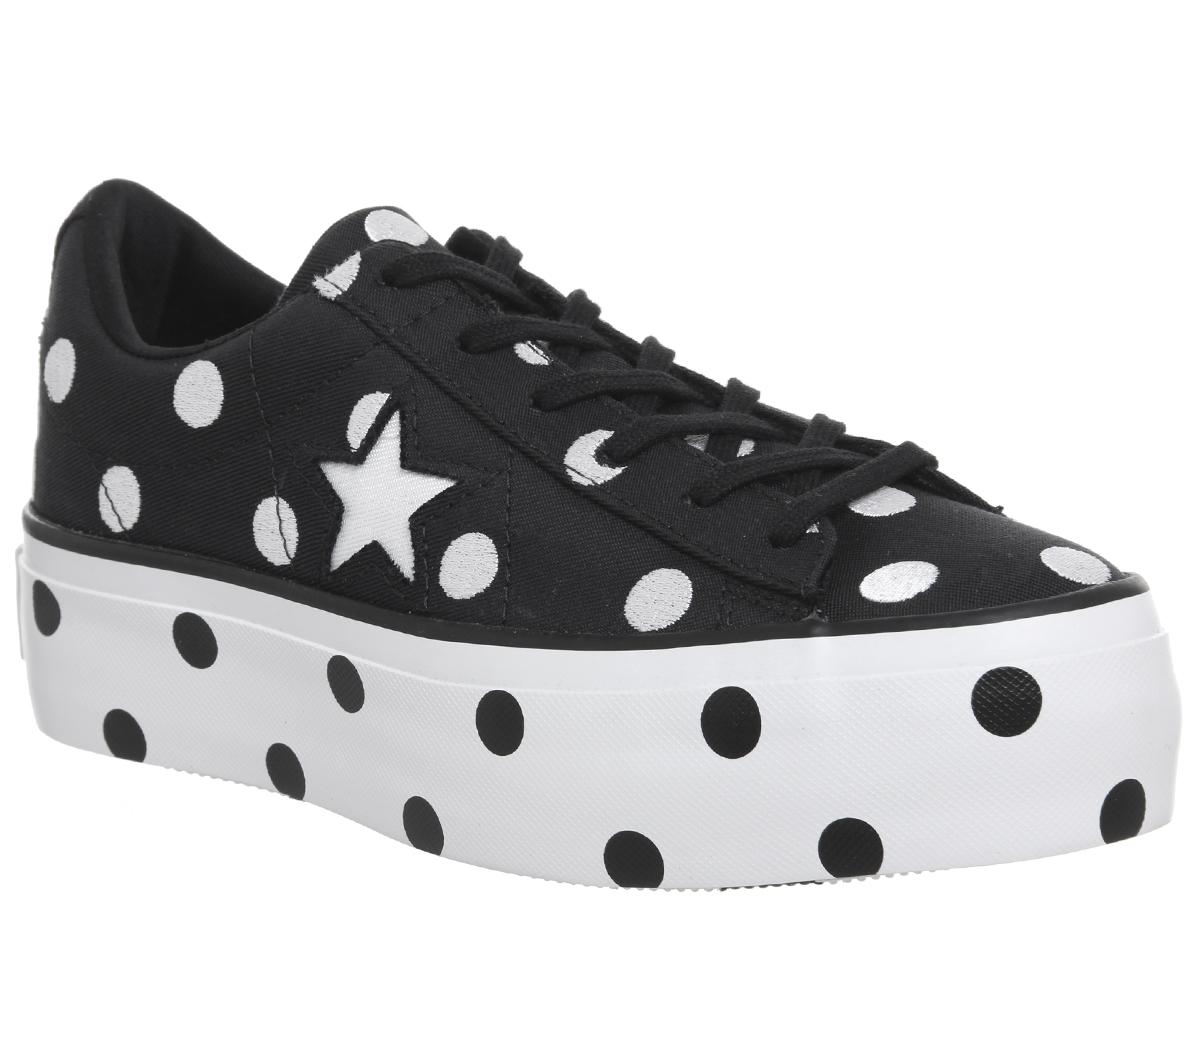 converse one star polka dot platform